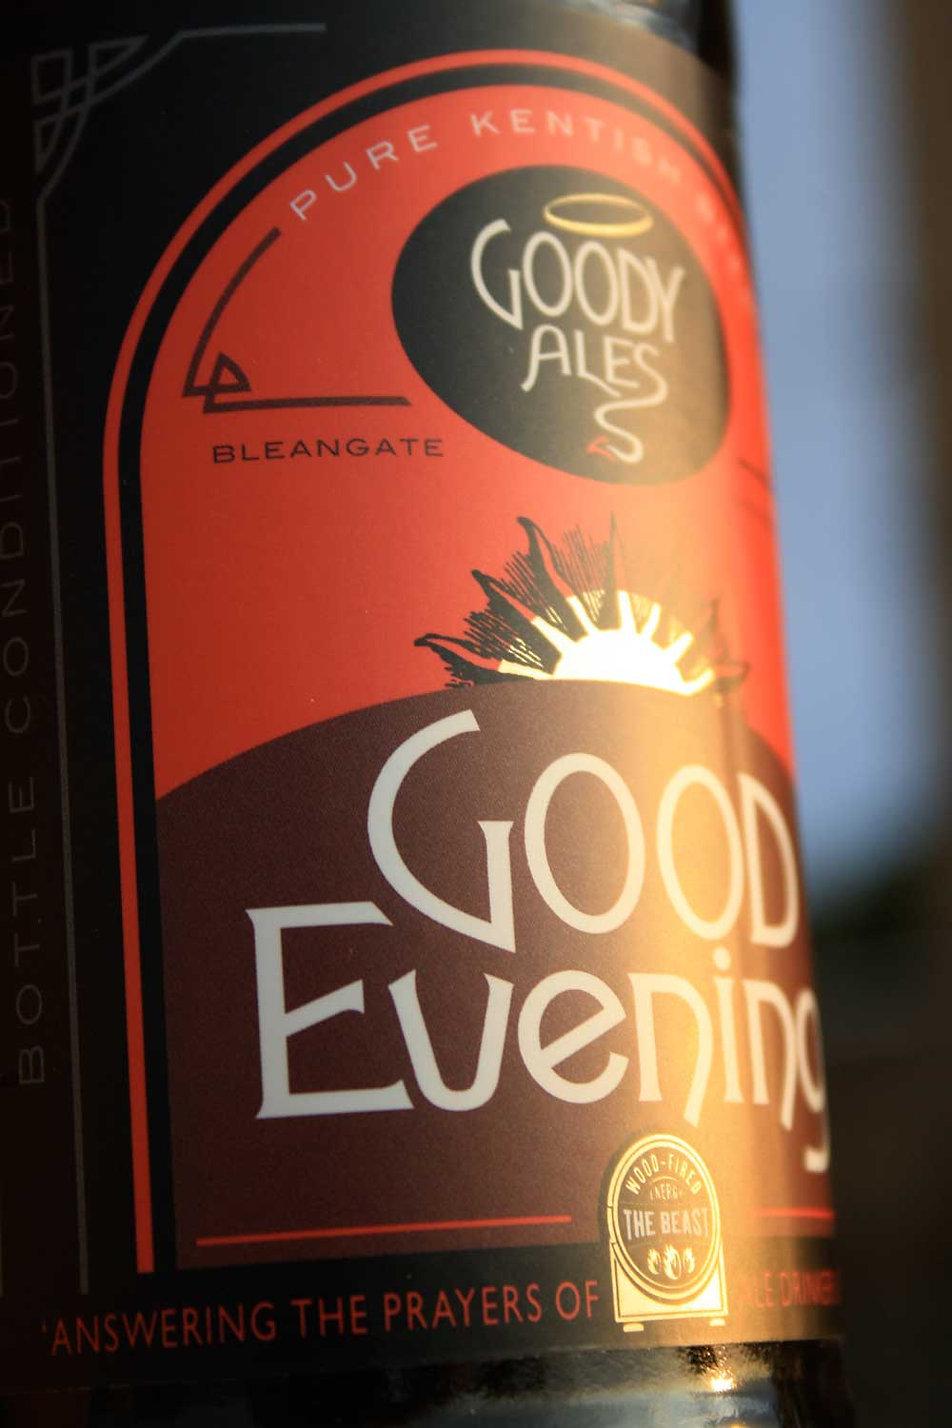 Sand Creative Goody Ales Good Evening